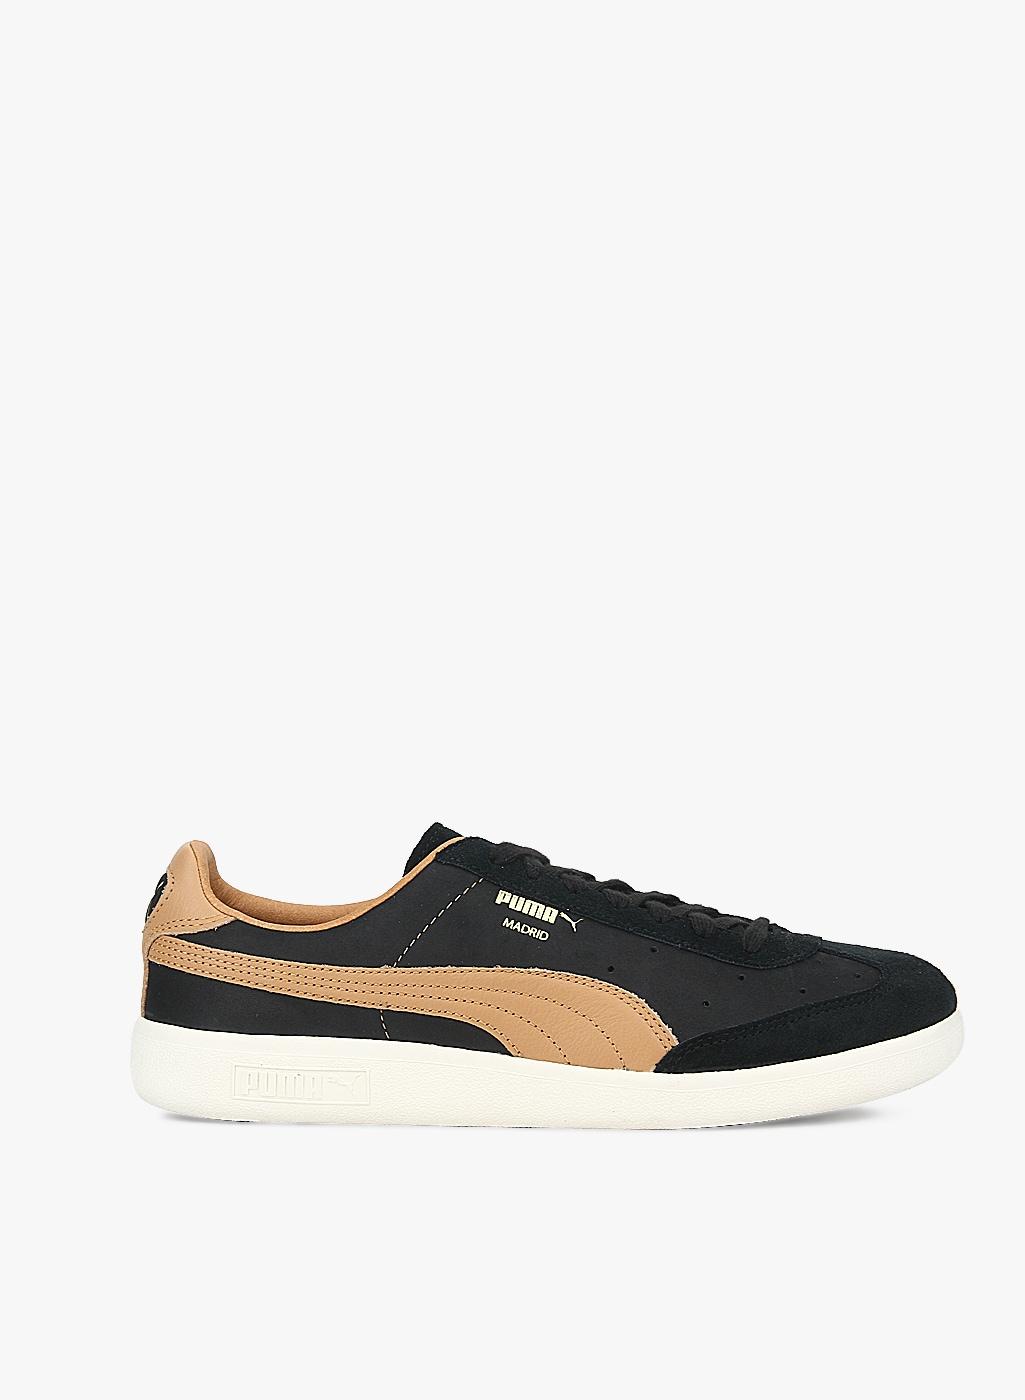 Buy Puma Madrid Tanned Black Sneakers Online 5767007 Jabong